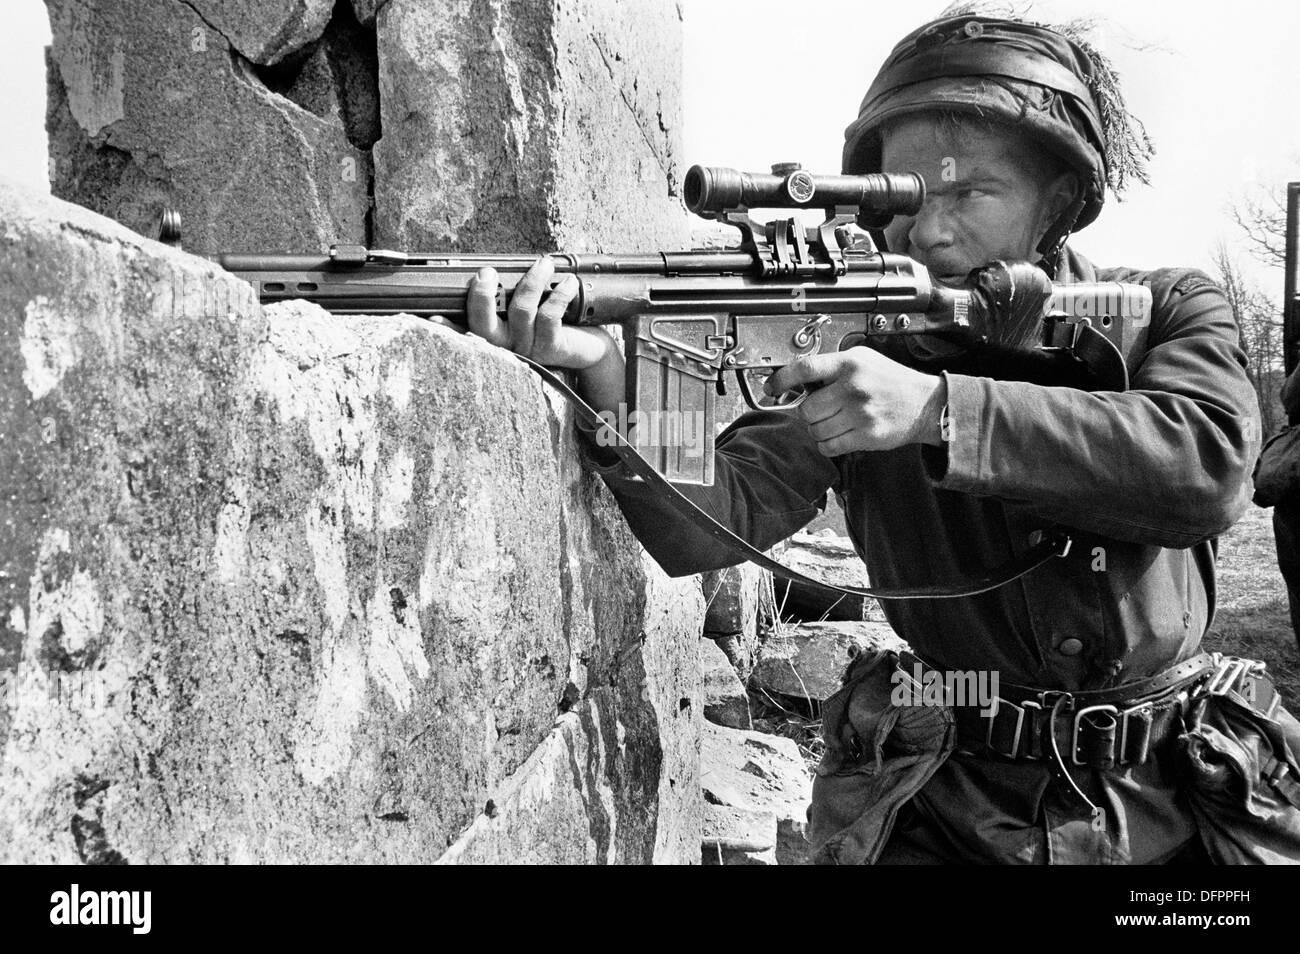 Swedish infantry soldier mid 1980s Swedish-conscript-soldiers-during-maneuvers-1988-k3-ranger-battalion-DFPPFH